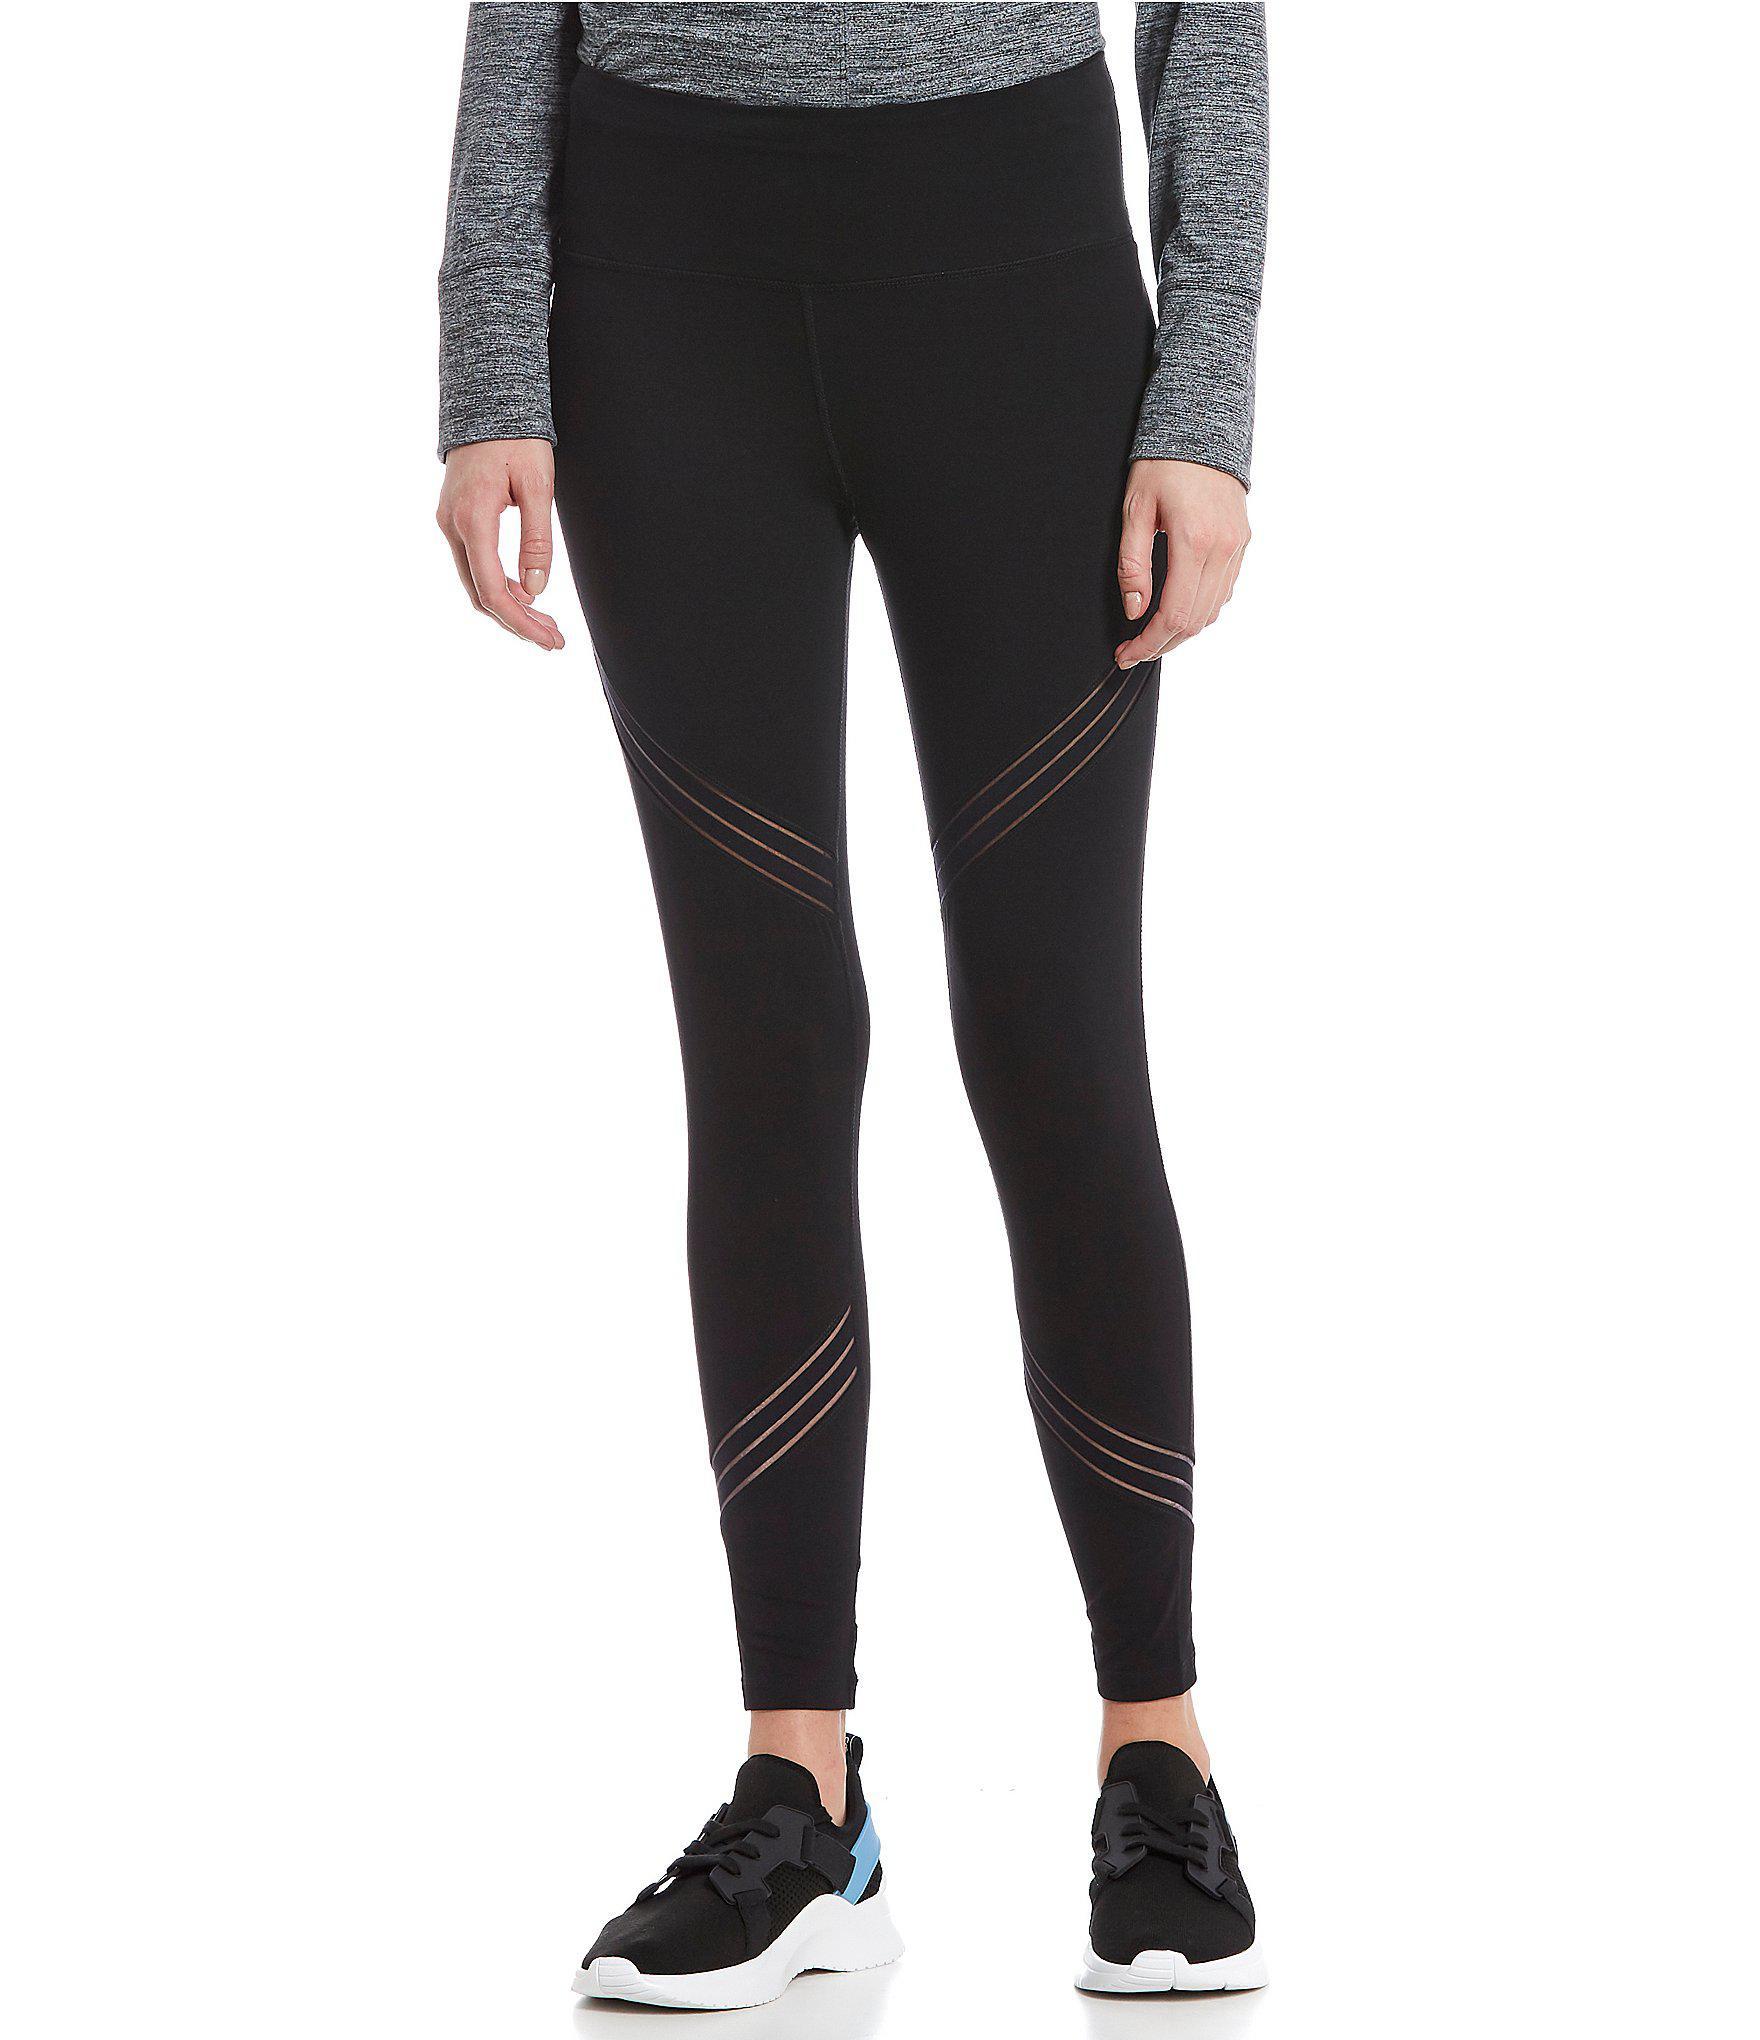 651df8f3c7b8 Calvin Klein. Women s Black Performance Novelty Leg Insets High Waist Knit  Leggings